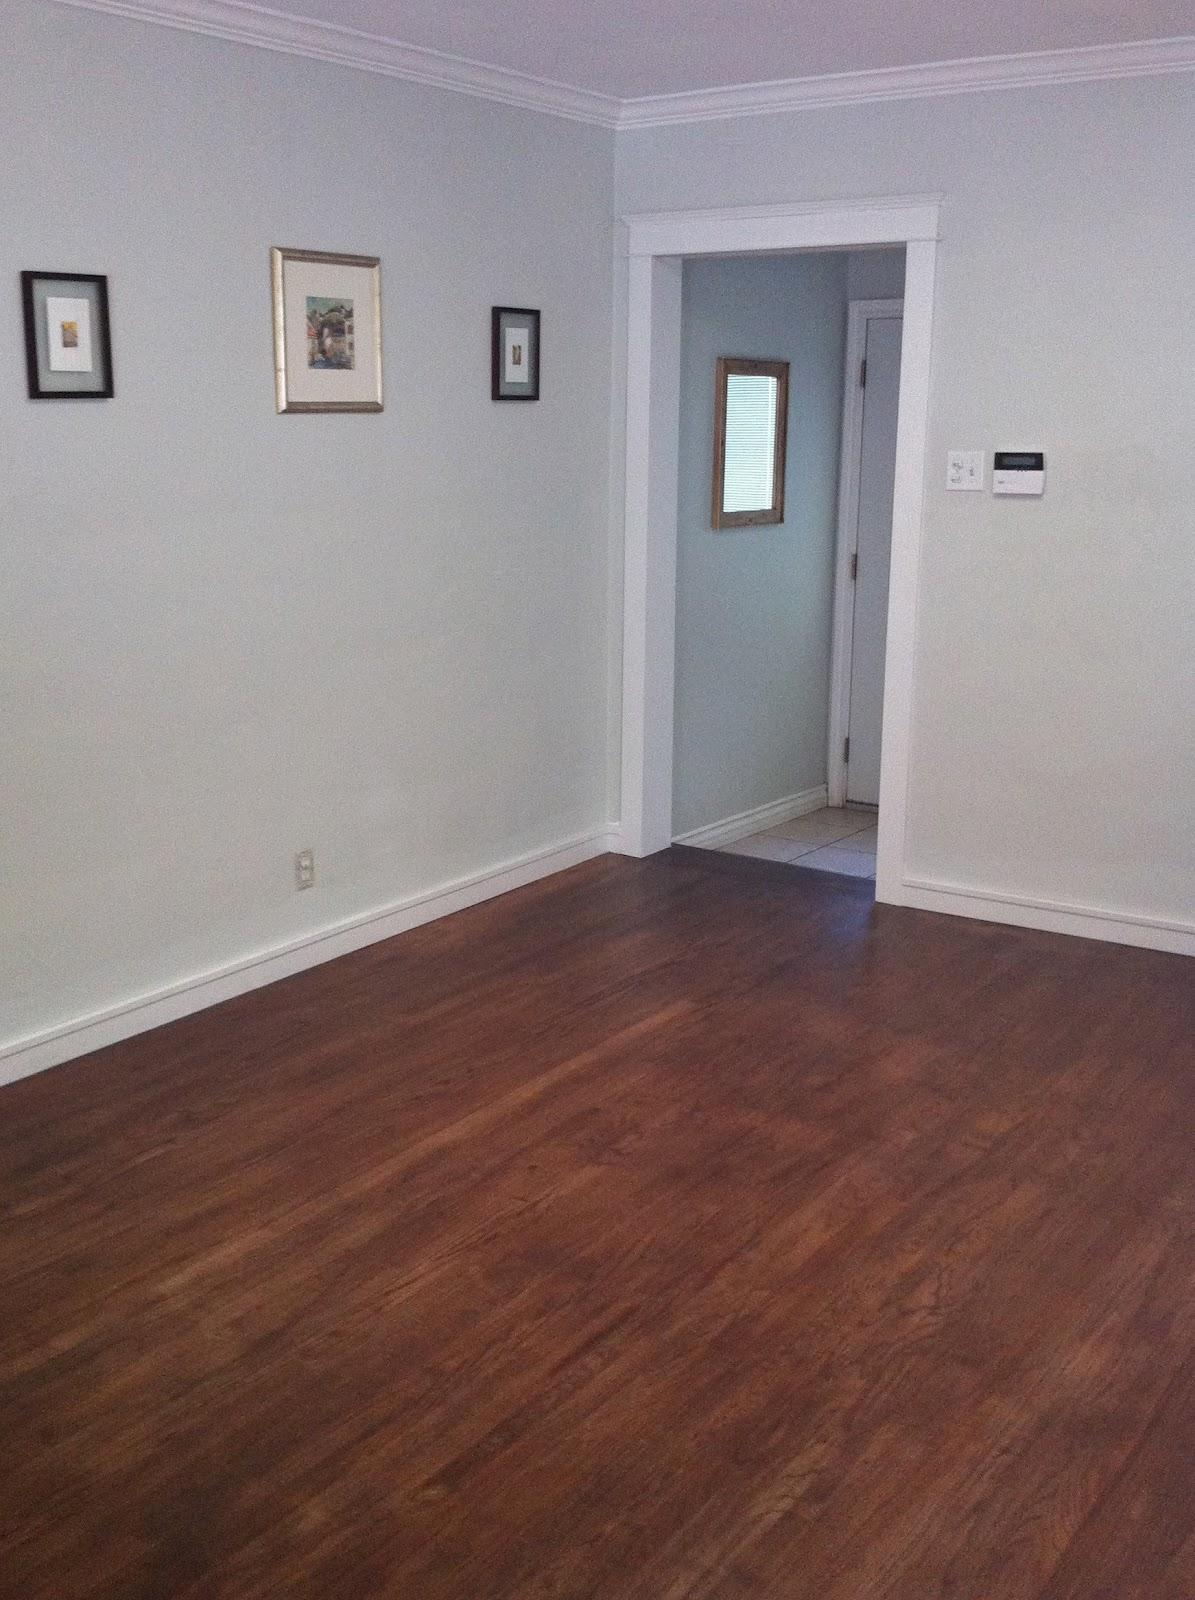 How To Install Hardwood Floors My Fifties Kitchen Redo Lay A Floor